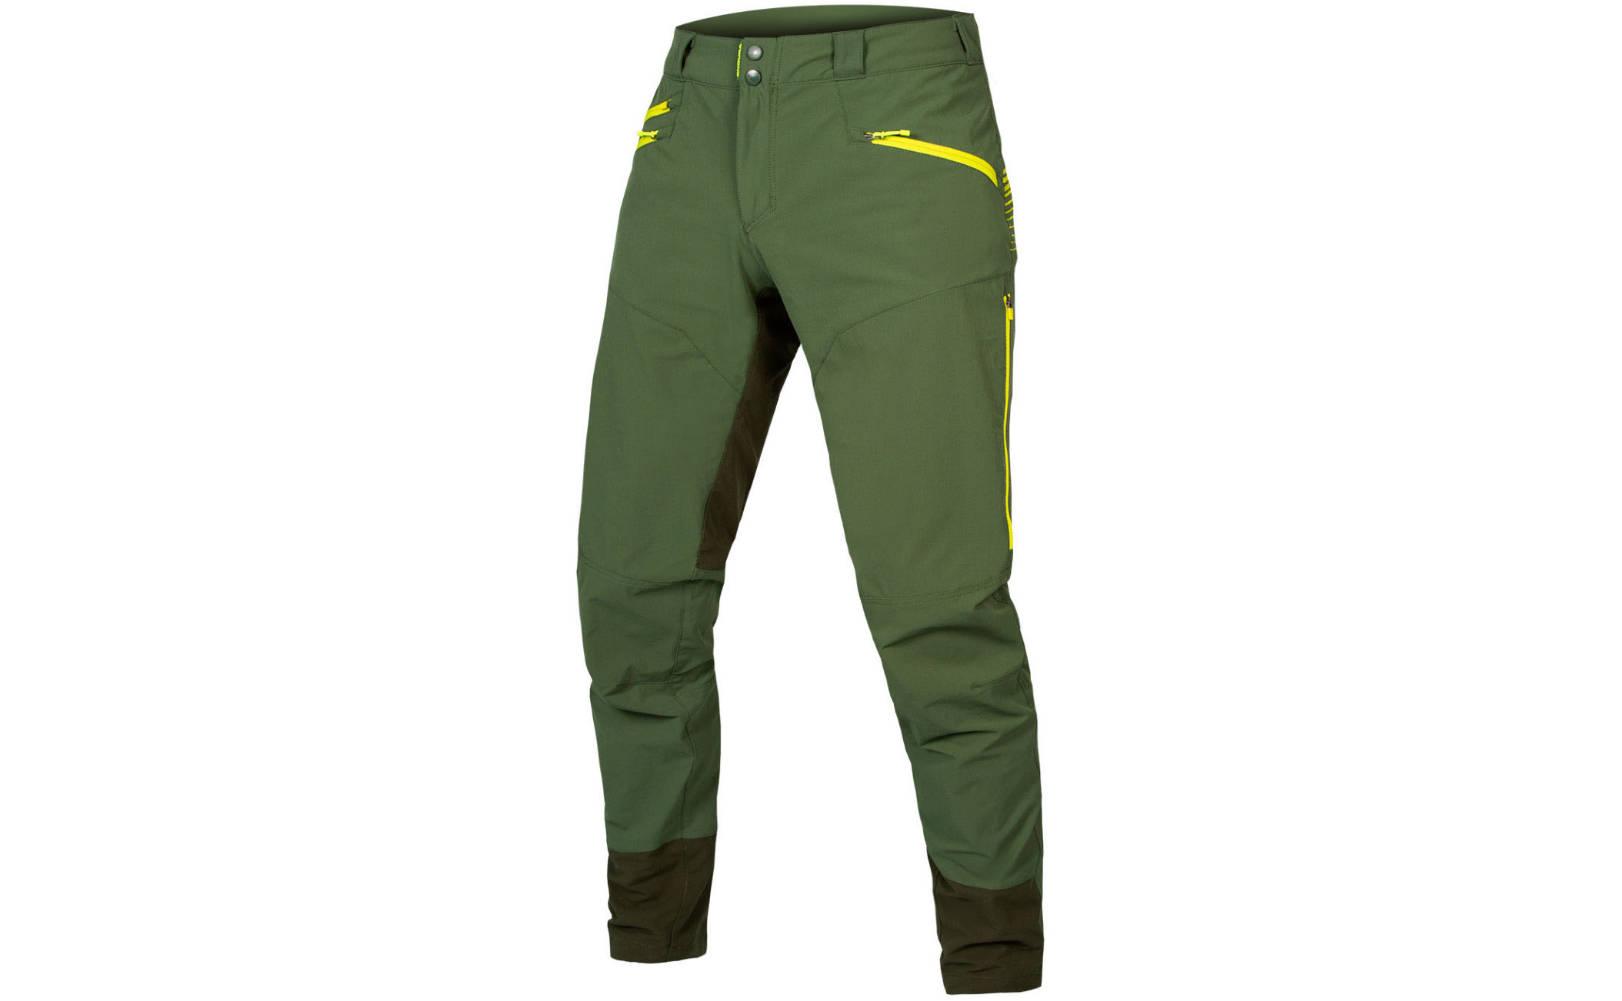 Endura SingleTrack II Trouser in Forest Green - Front